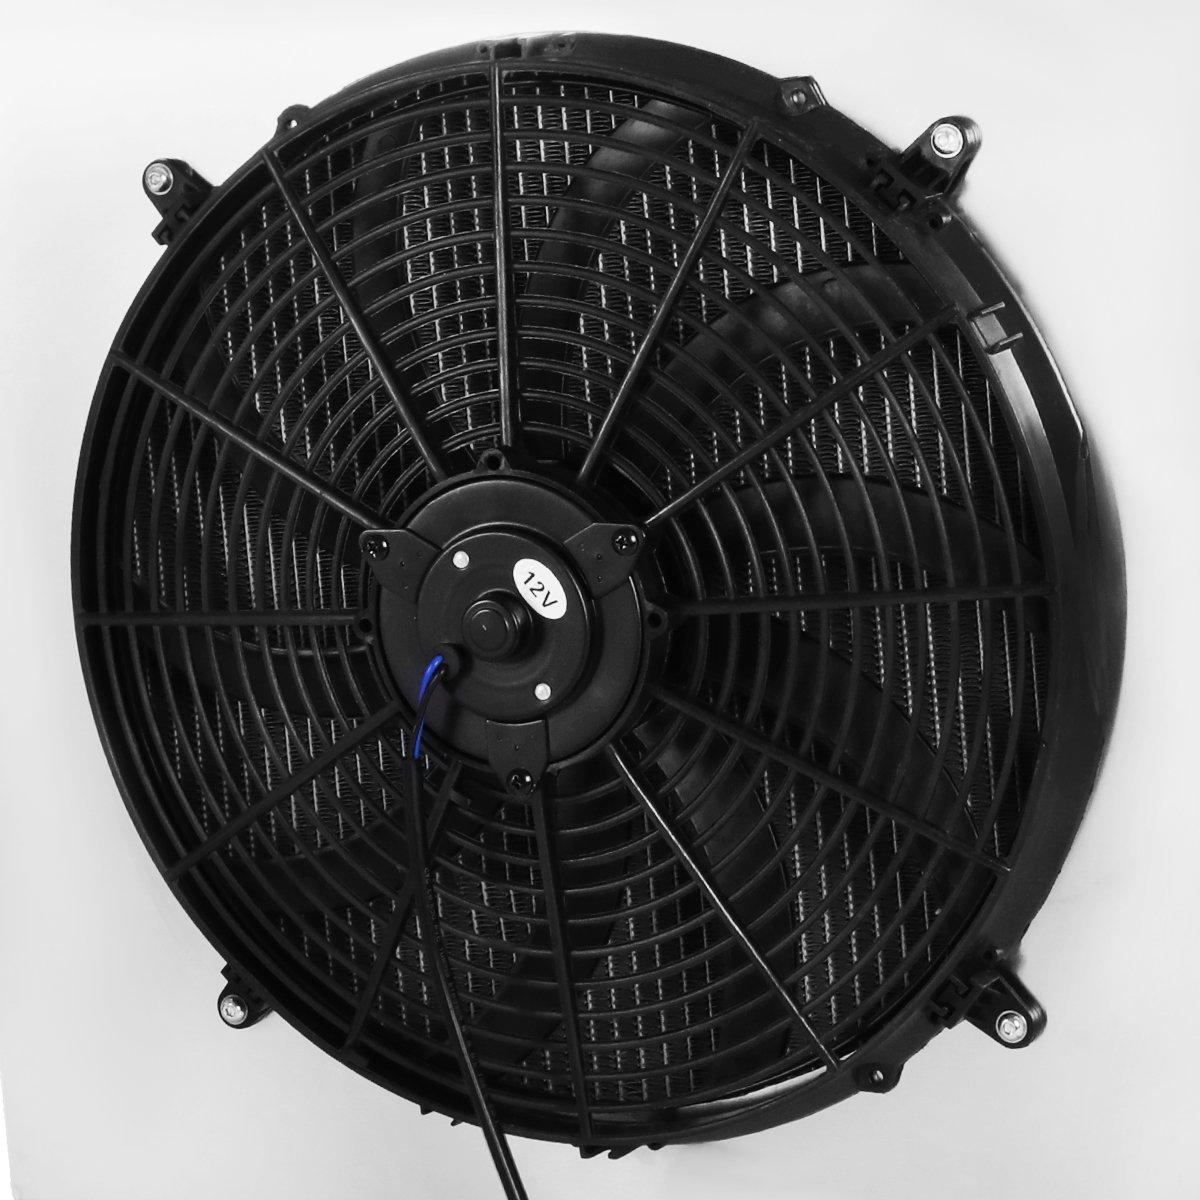 For Jeep Wrangler Yj Tj 24l 42l 3 Row Tri Core Heater Box Wiring Harness Fan Relay Aluminum Radiator 12v Shroud Automotive